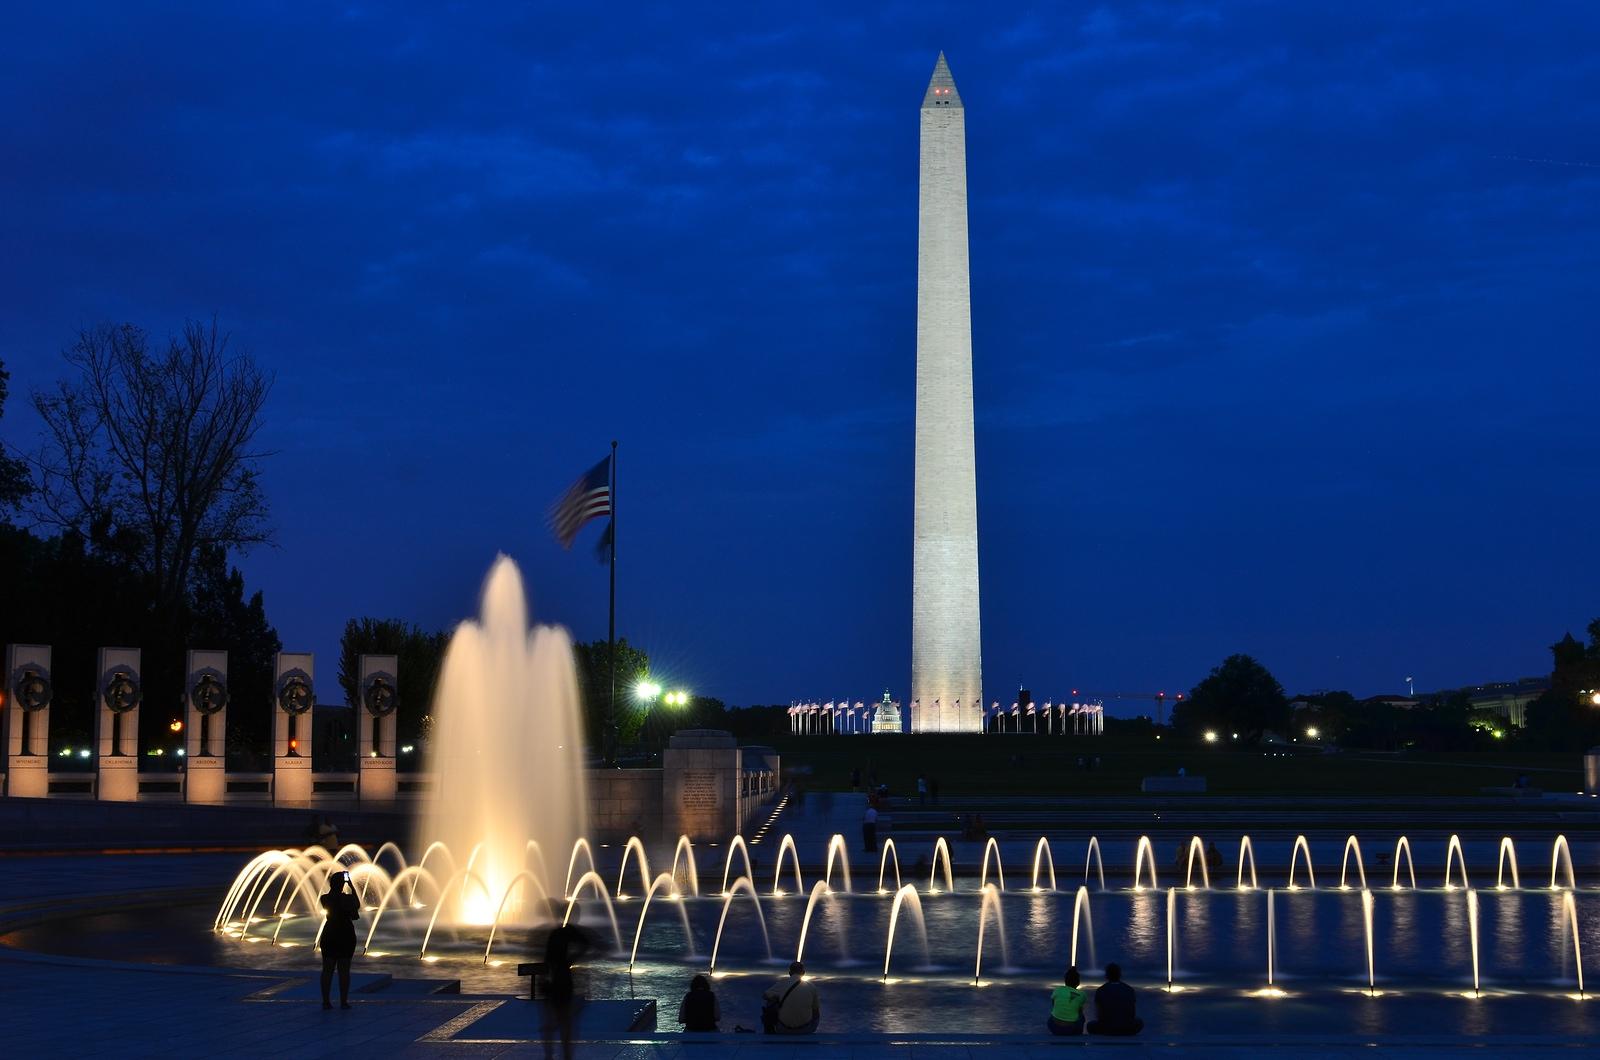 bigstock-Washington-DC-National-Mall-n-36667399